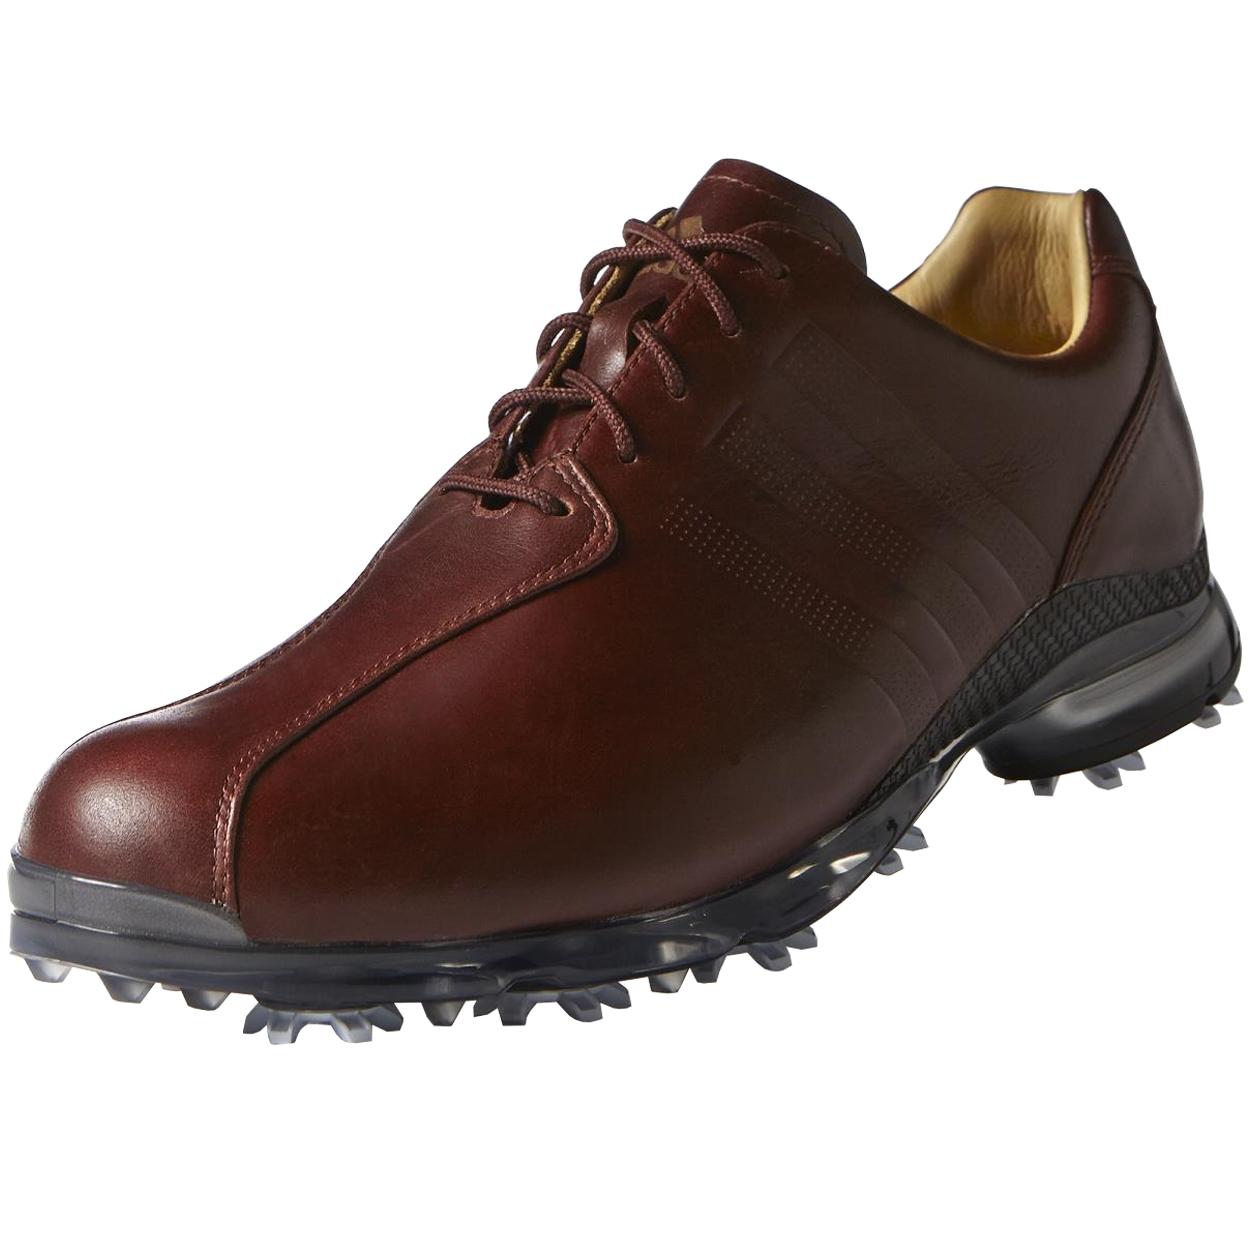 adidas adipure tp leather golf shoe